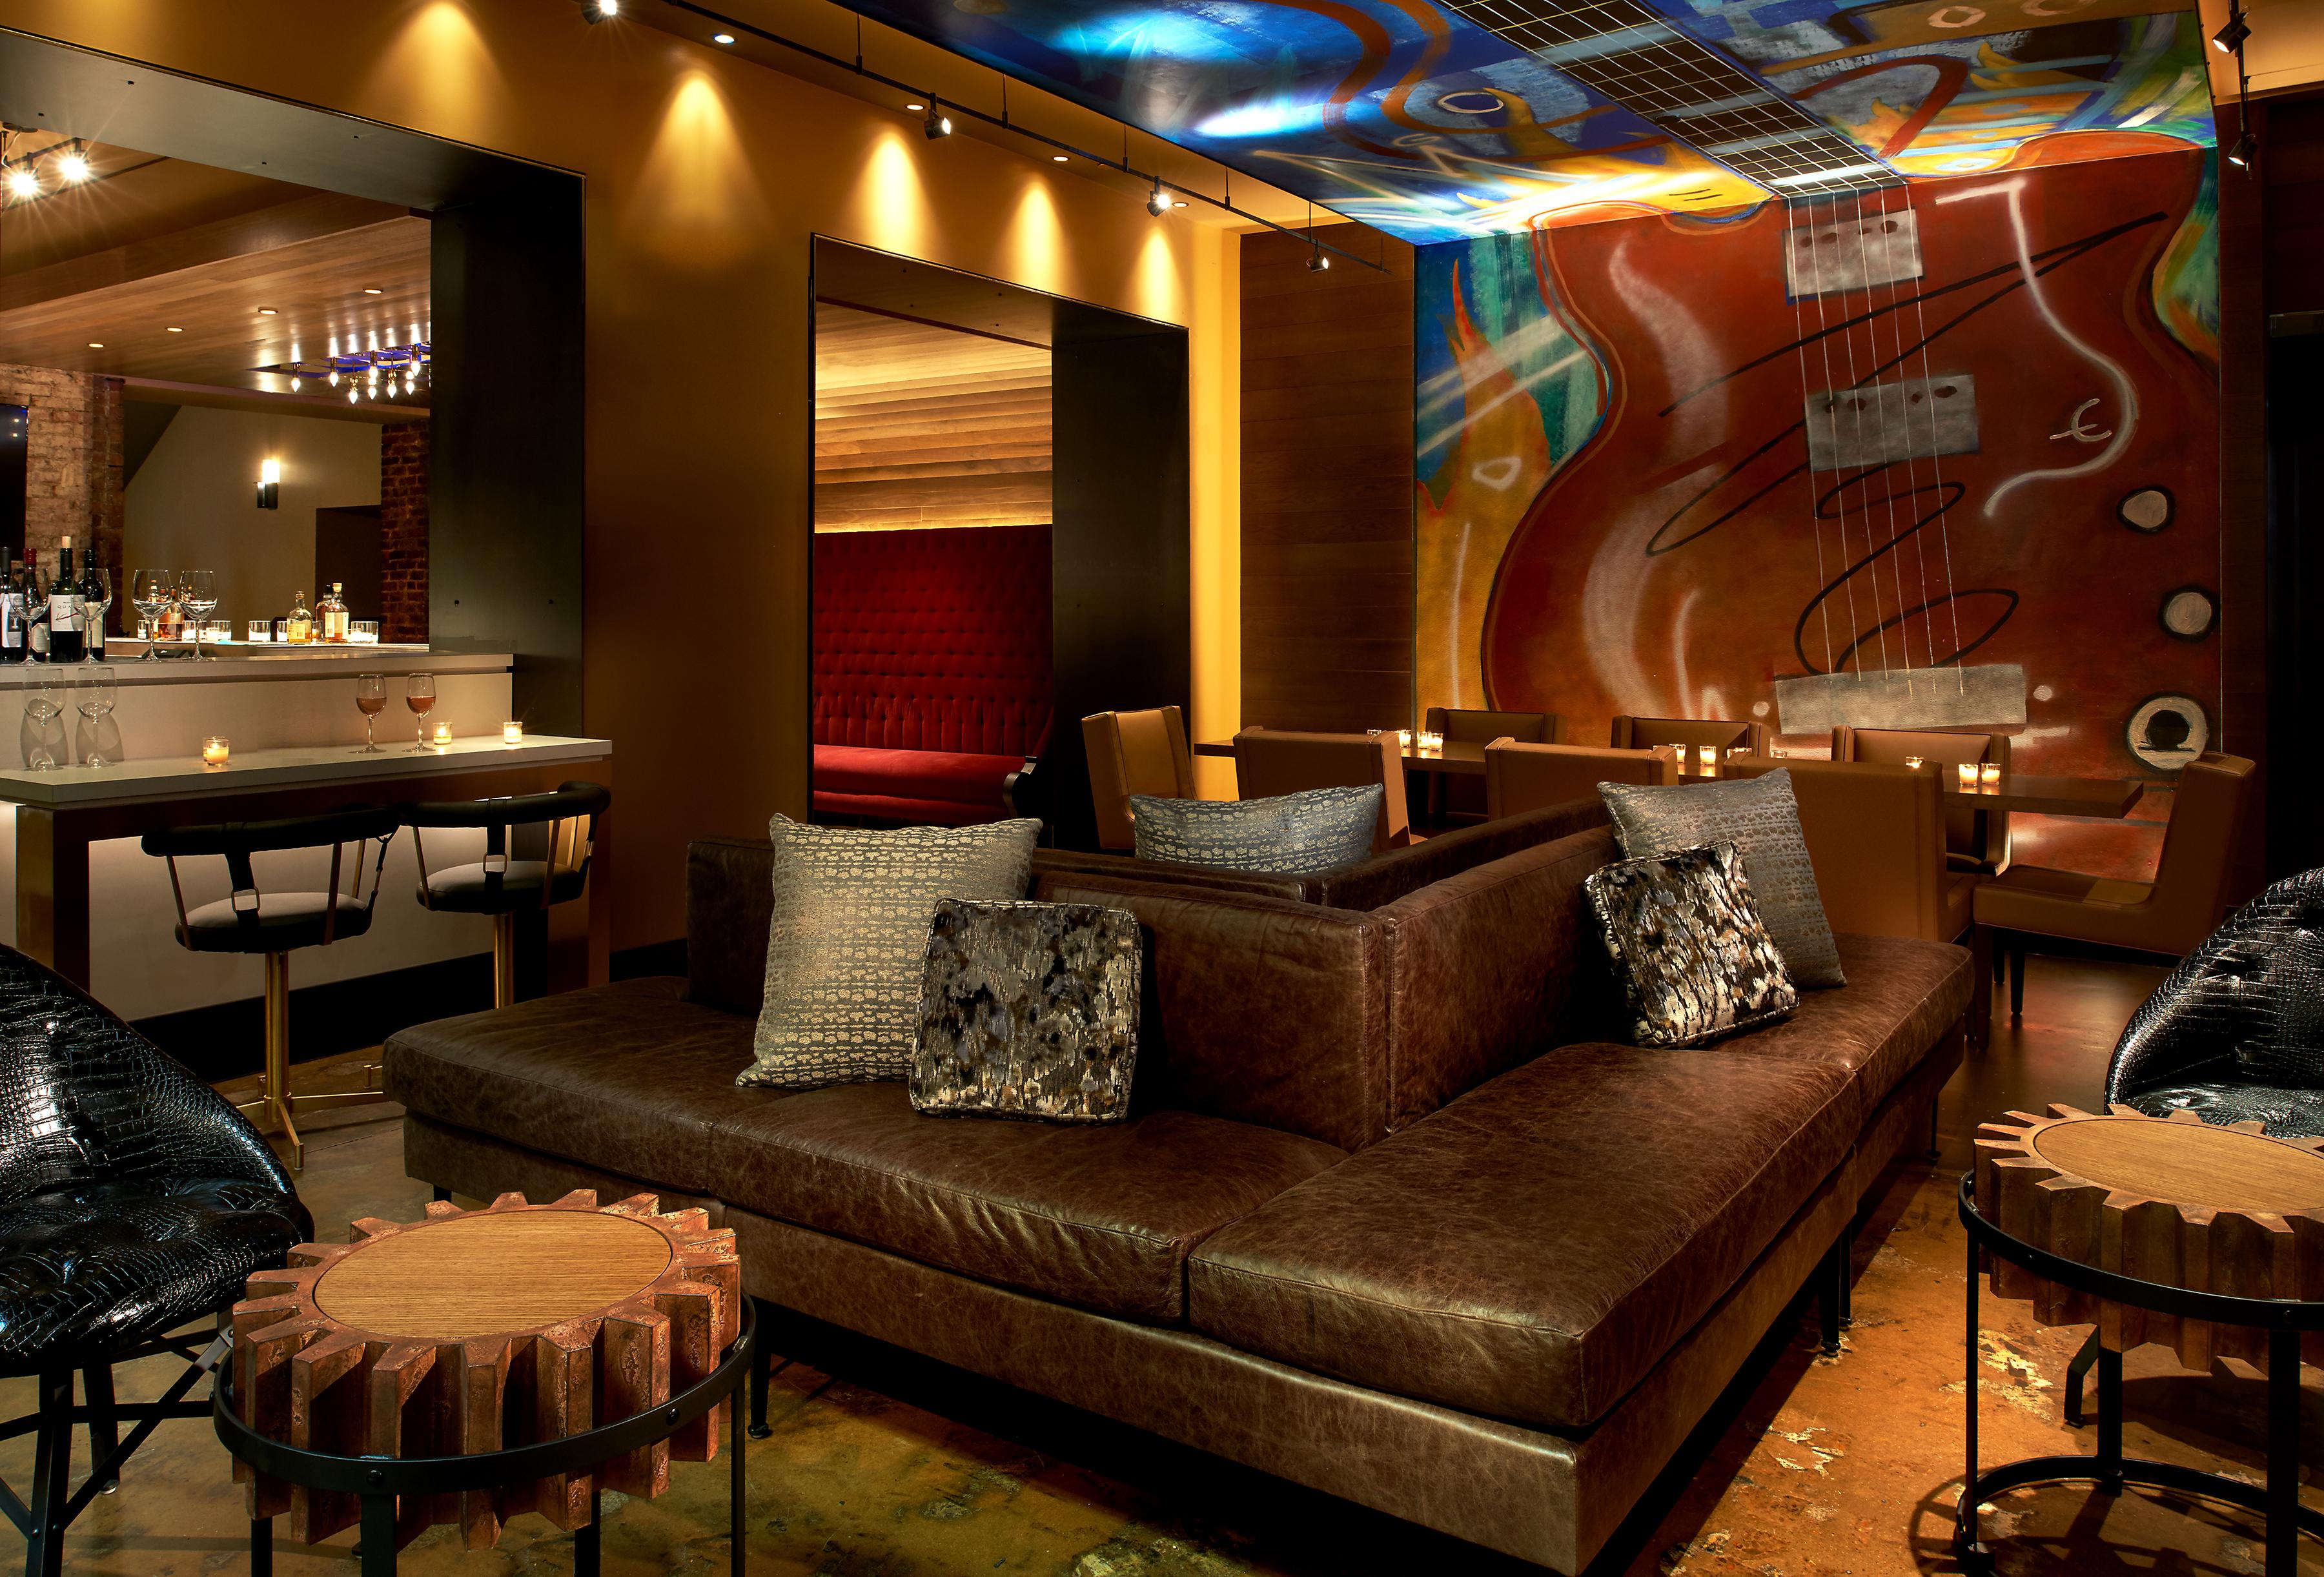 Carter S Downtown Nashville Restaurant Union Station Hotel